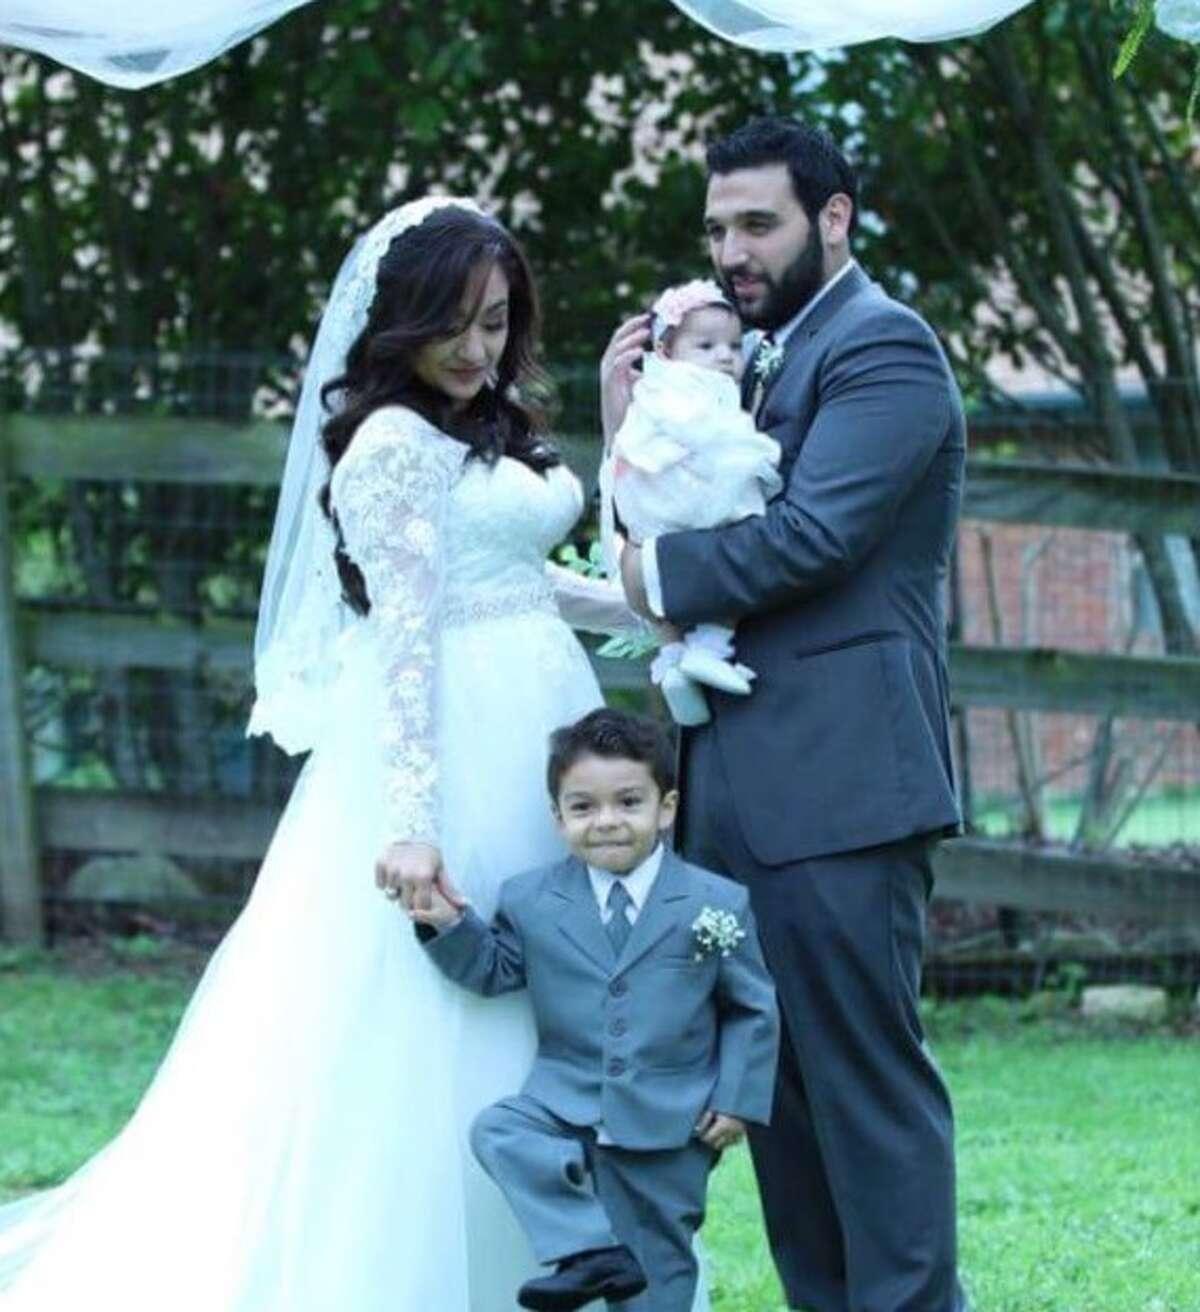 Samir Deais shared this family photo showing himself, wife Stephanie, son Alexander and daughter Ava Lynn.